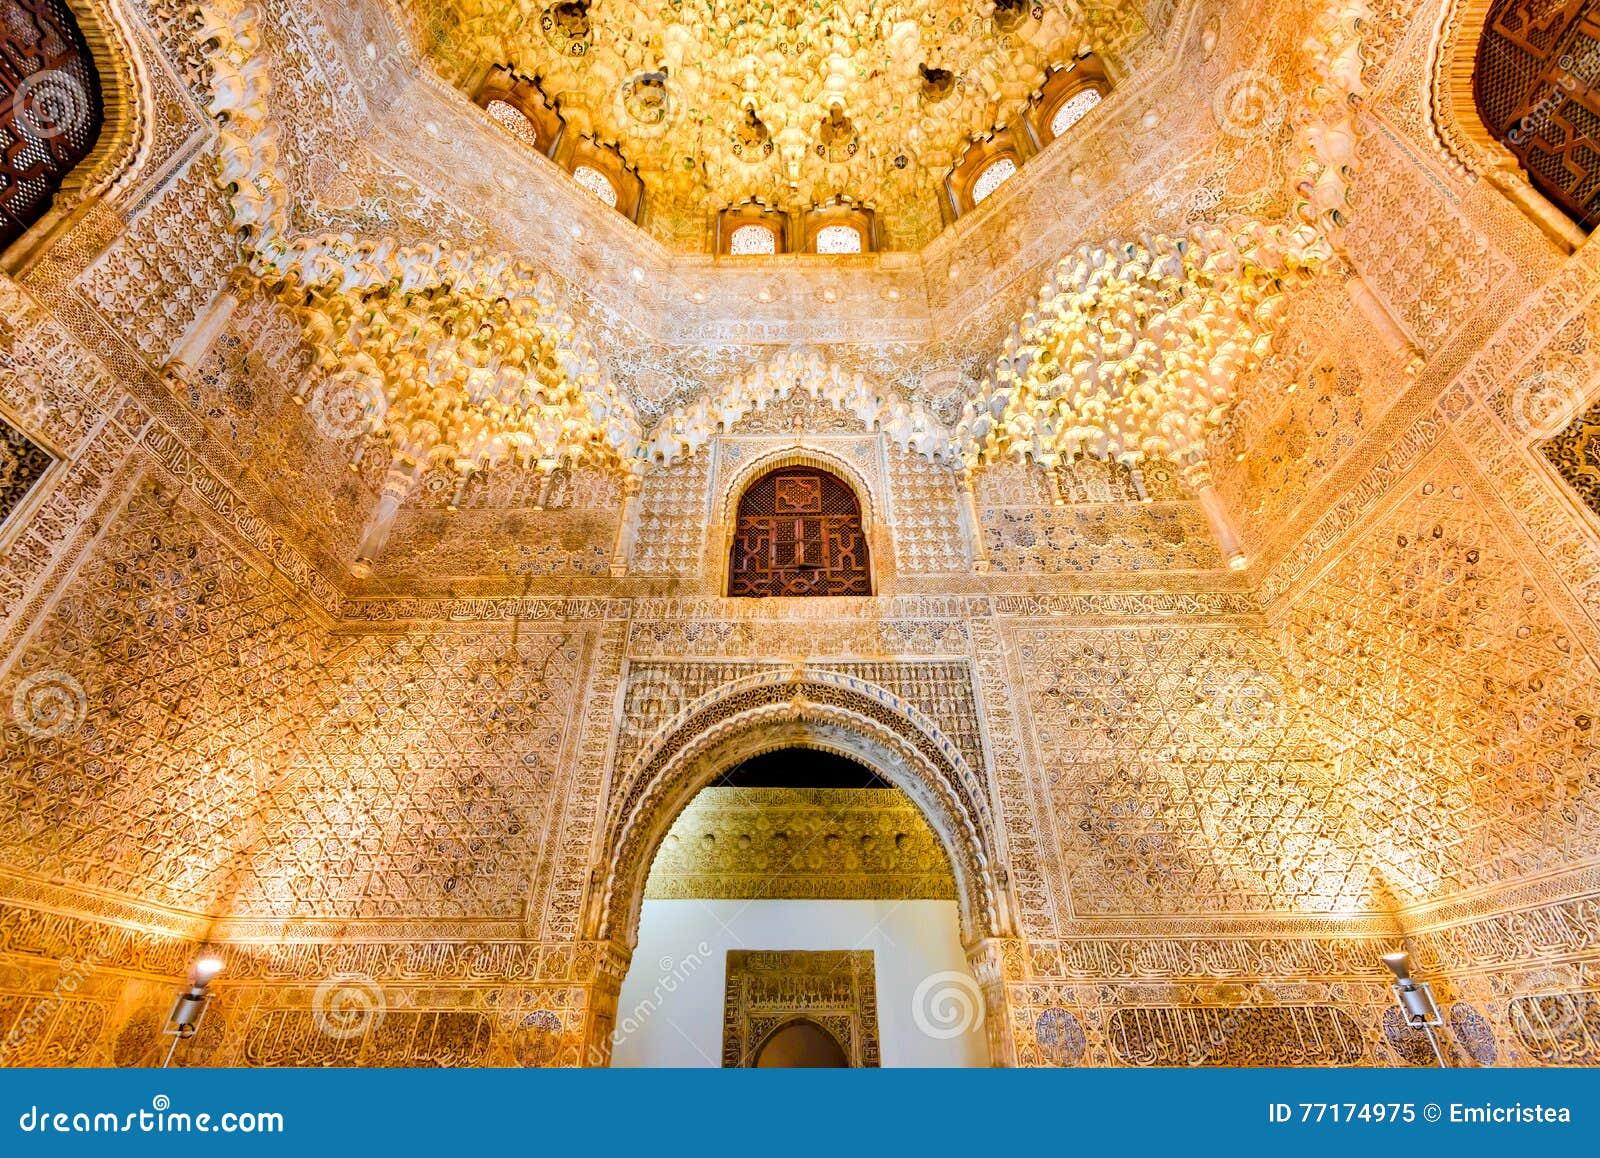 Granada, Andalusia, Spanje - Alhambra Palace